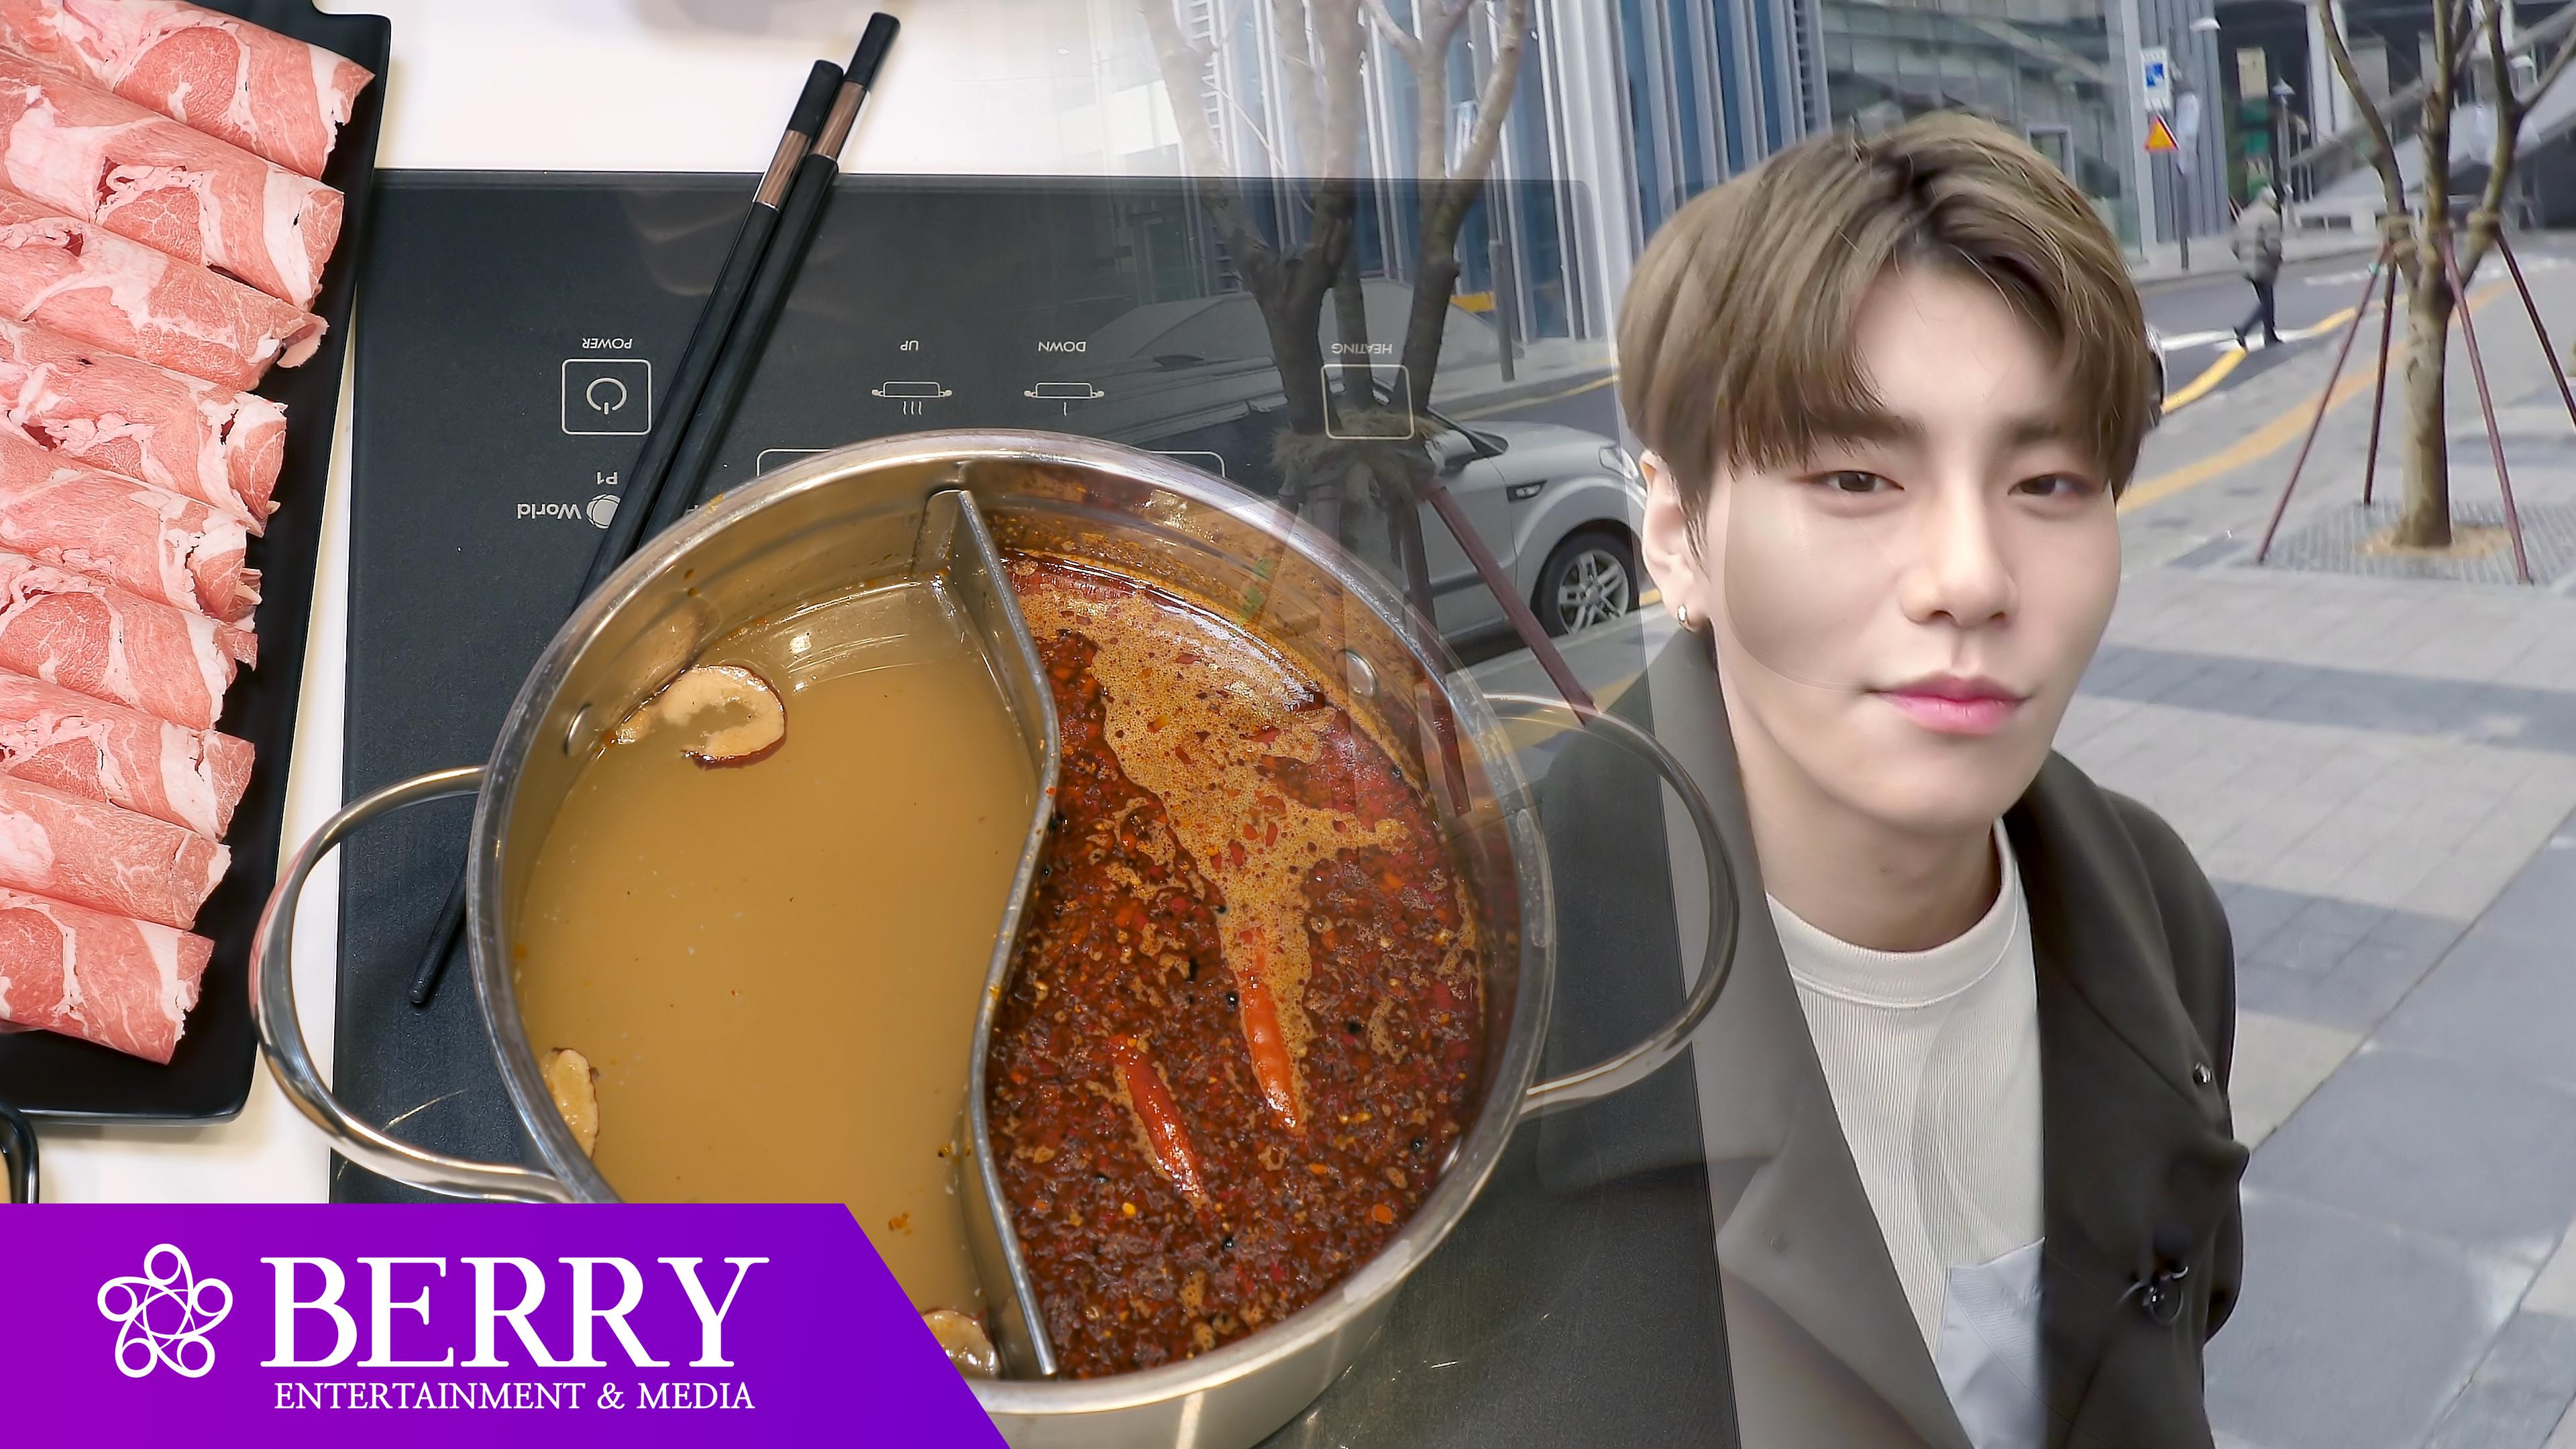 JBJ 상균&동한의 혼밥스타그램#21회 글로벌 혼밥 (#상균 #훠궈)